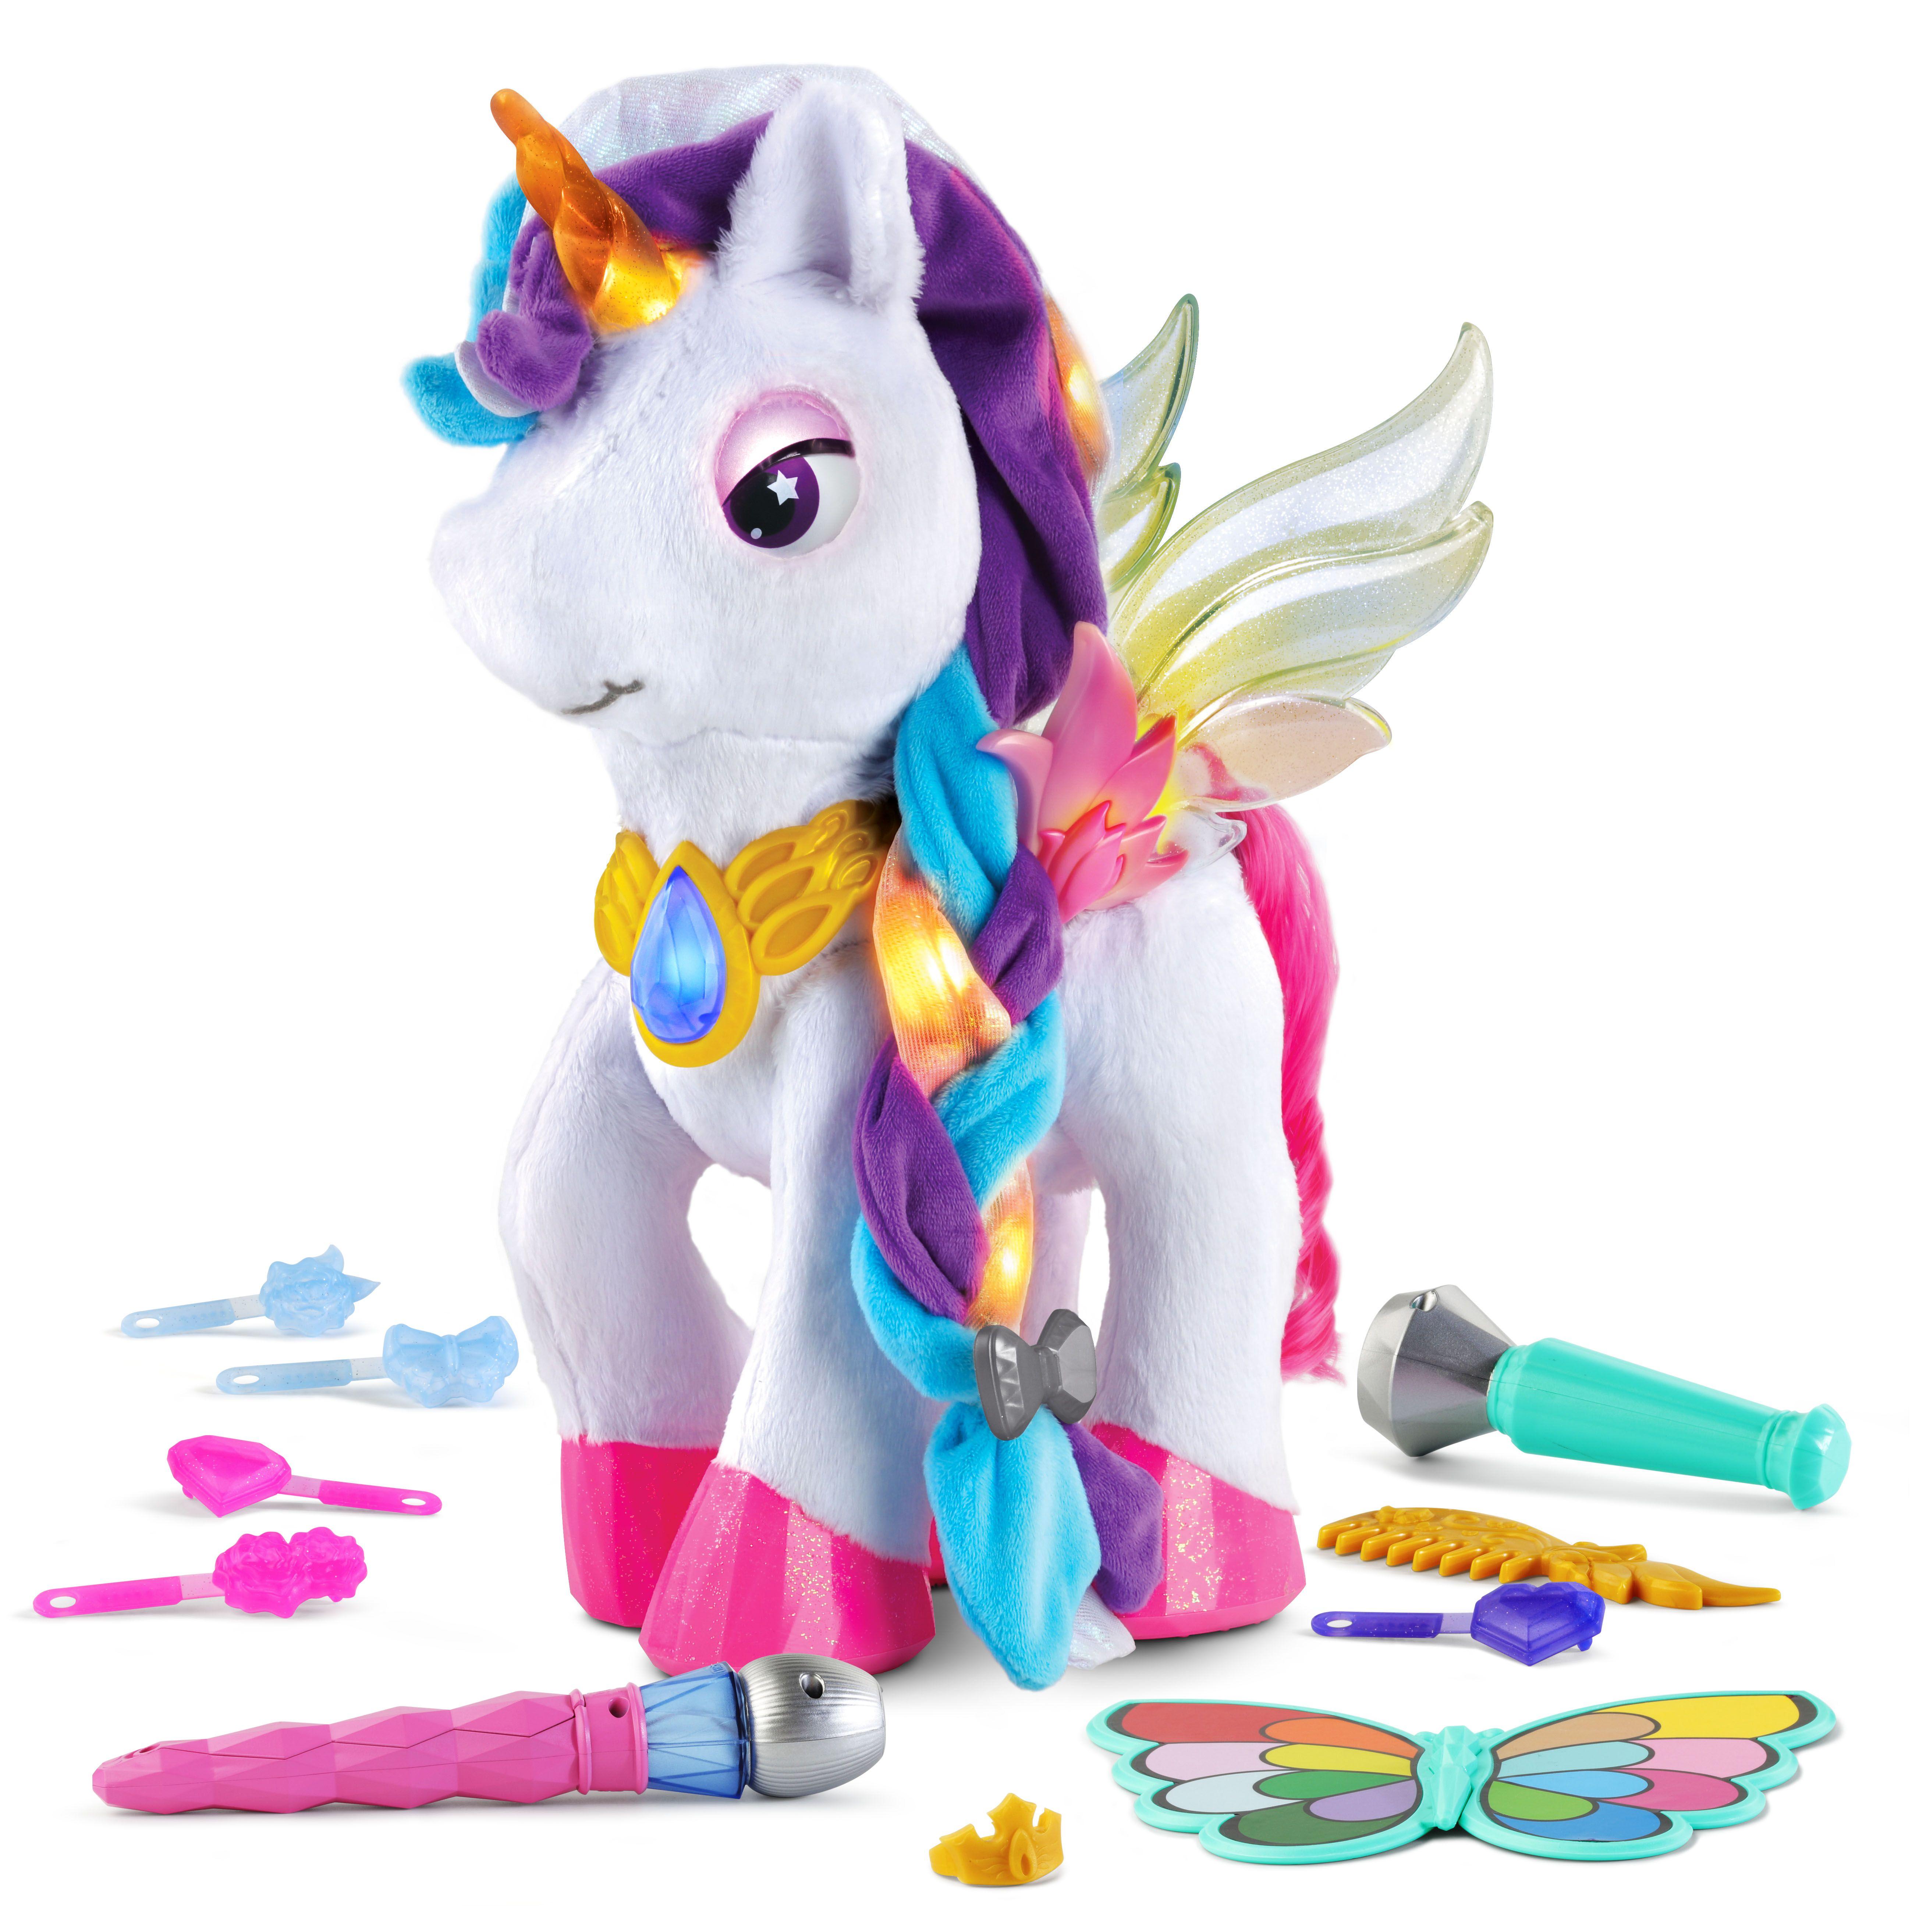 Vtech Myla The Magical Unicorn Walmart Com Unicorn Toys Magical Unicorn Preschool Toys